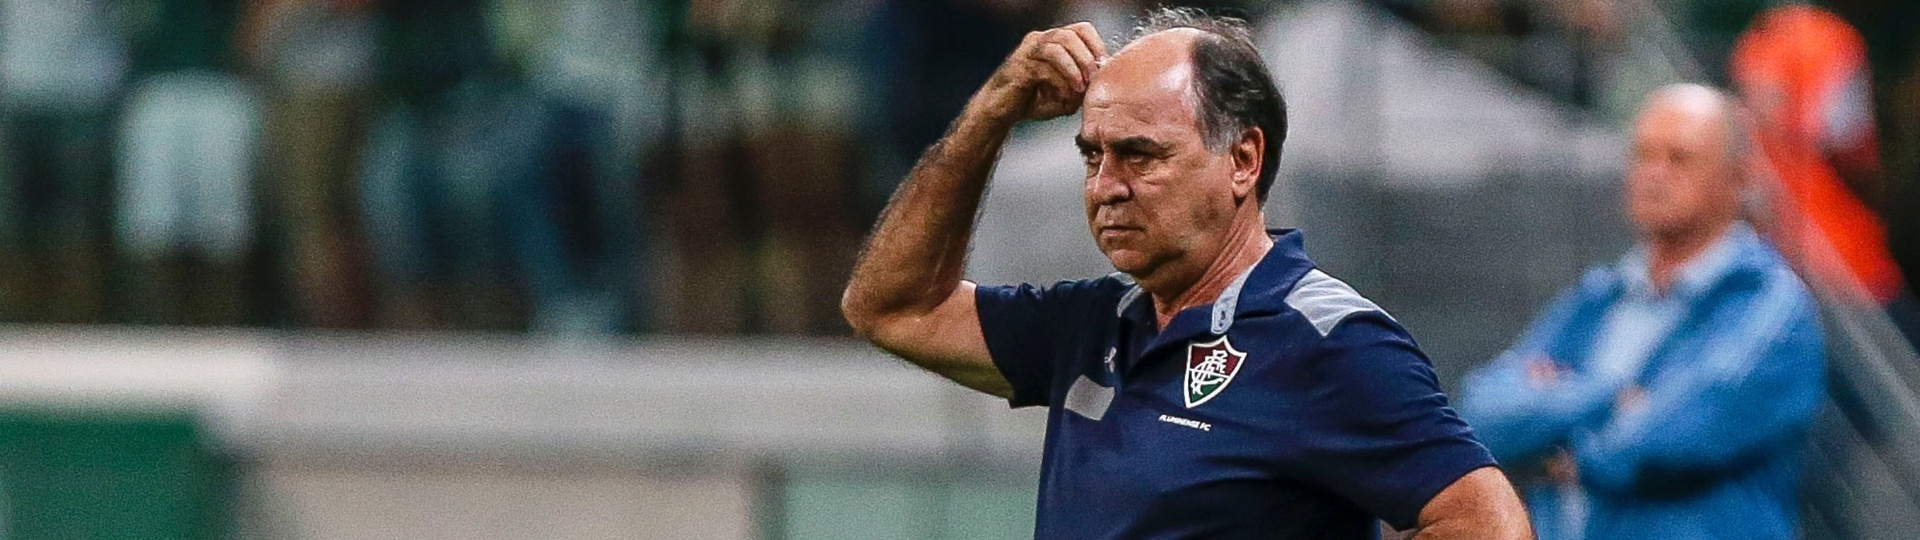 Técnico do Fluminense, Marcelo Oliveira acompanha jogo contra o Palmeiras